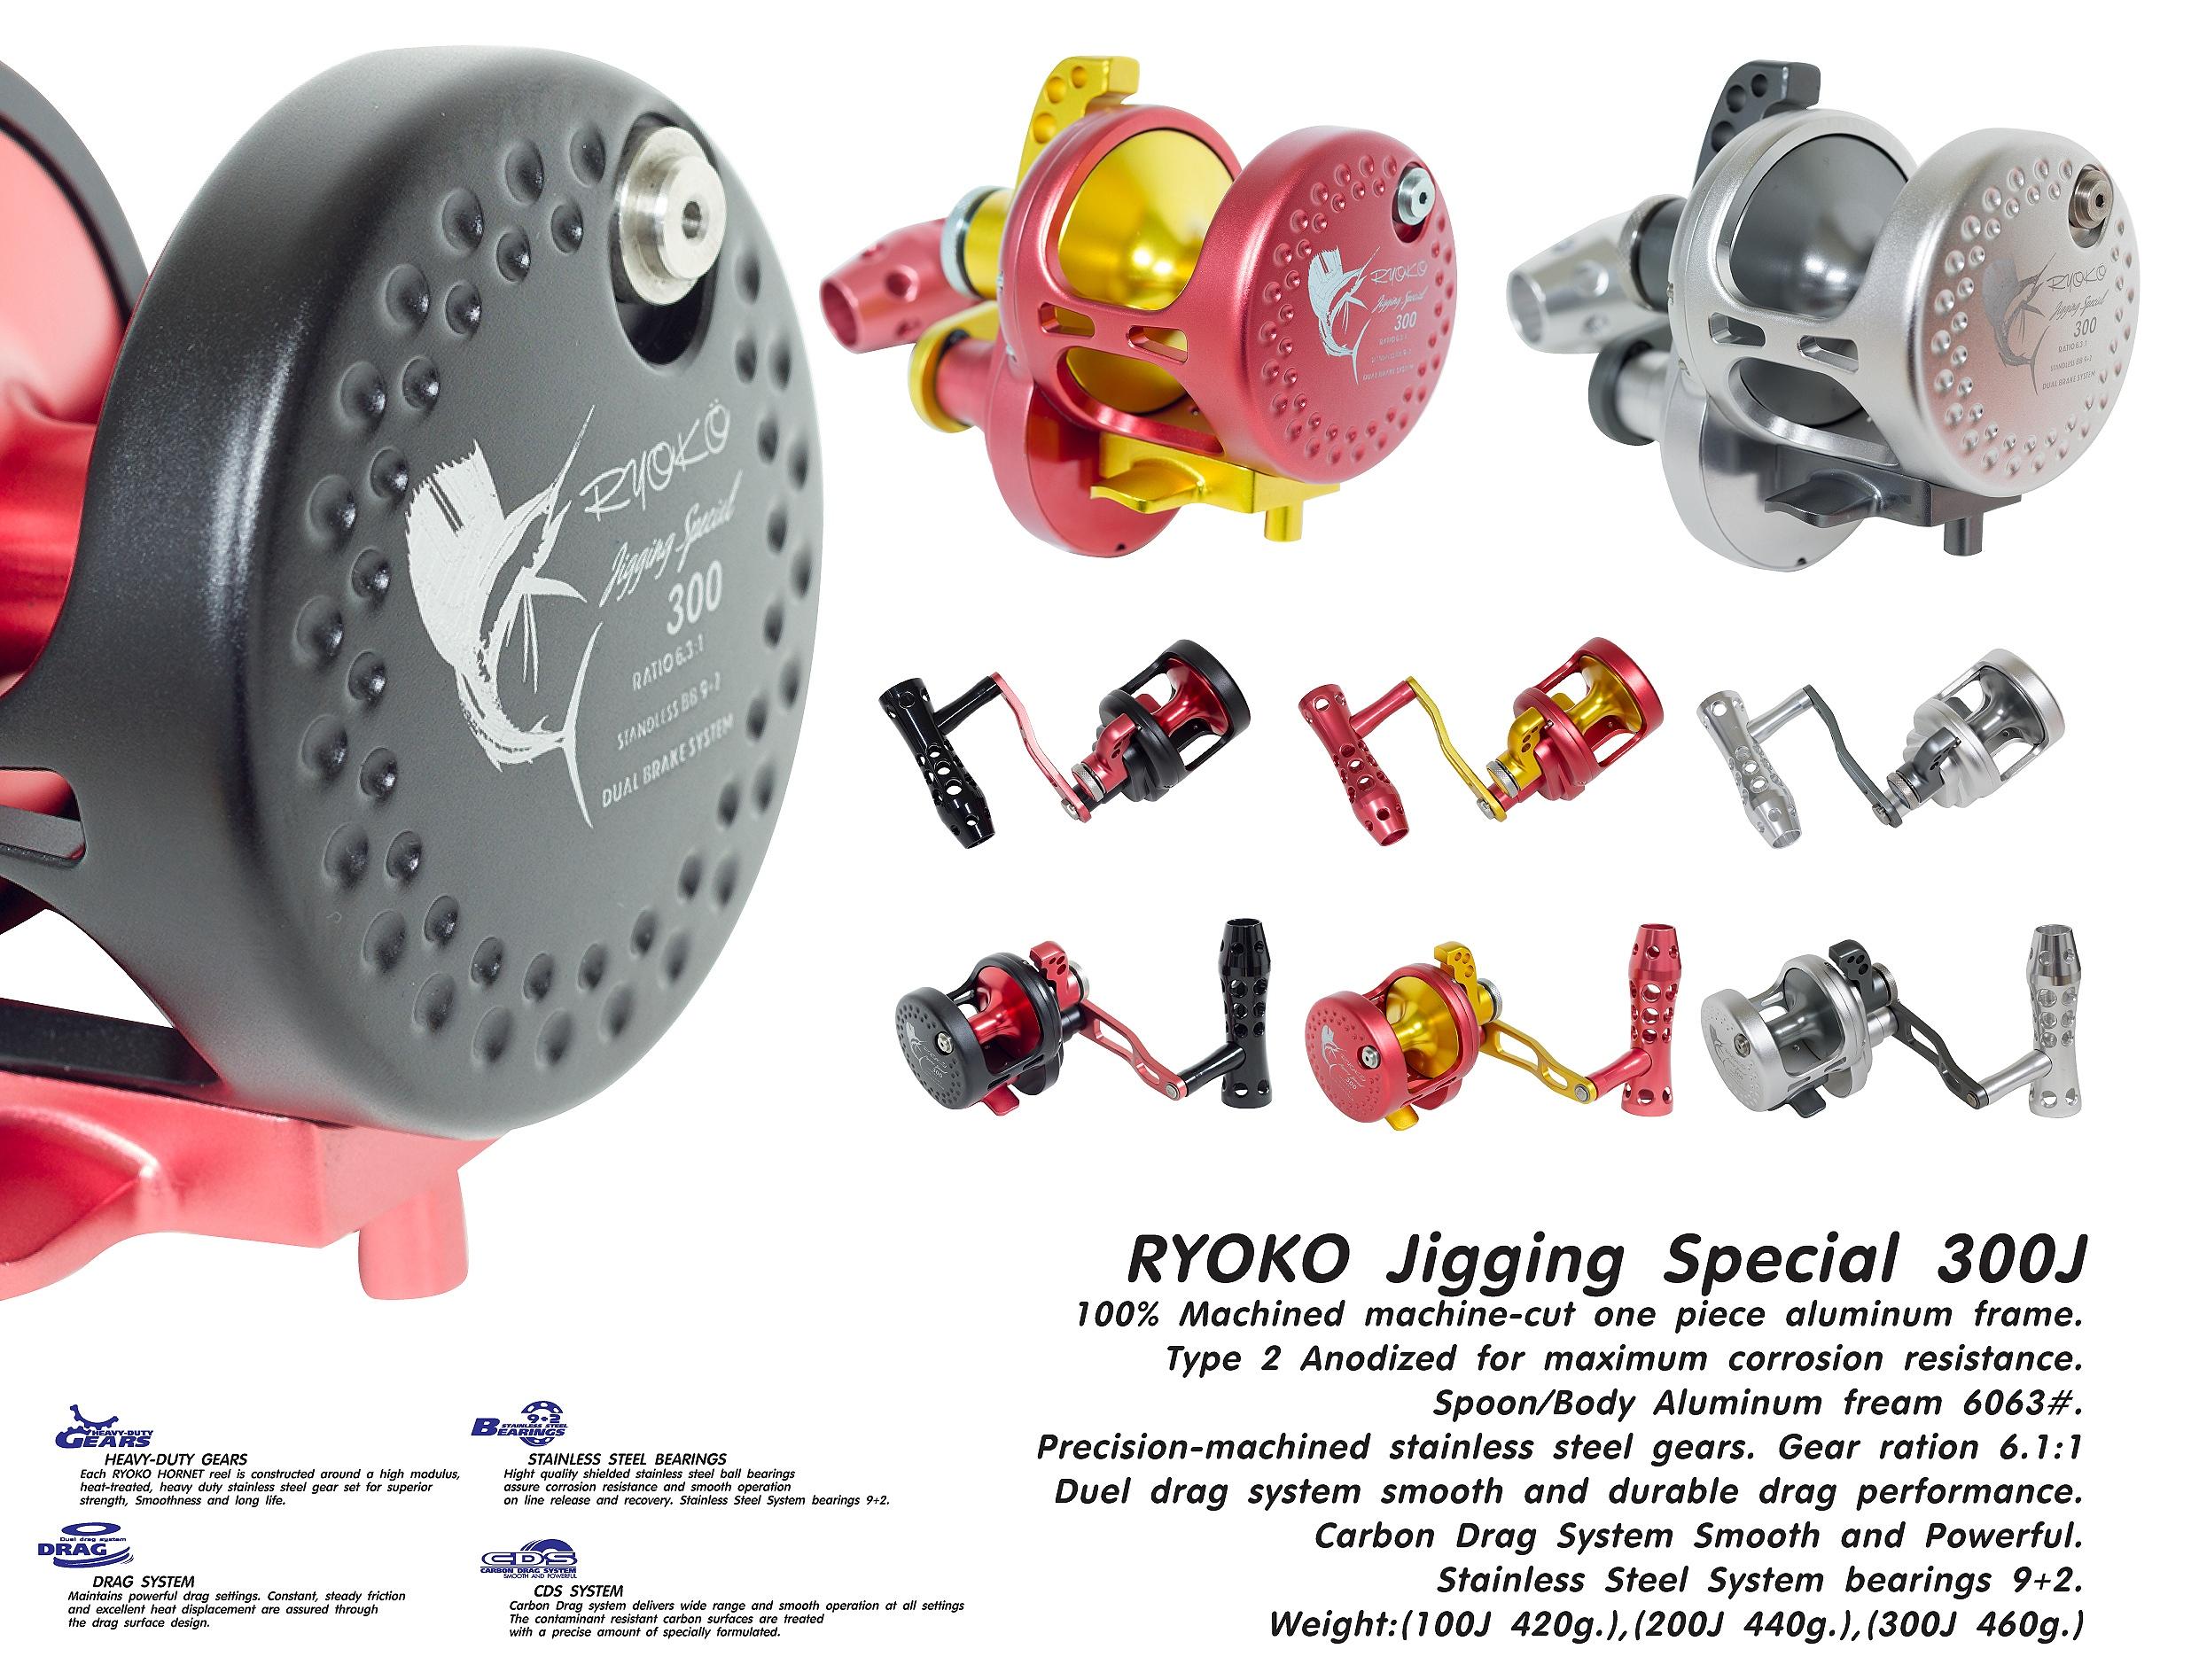 Ryoko Jigging Special 2017 300R